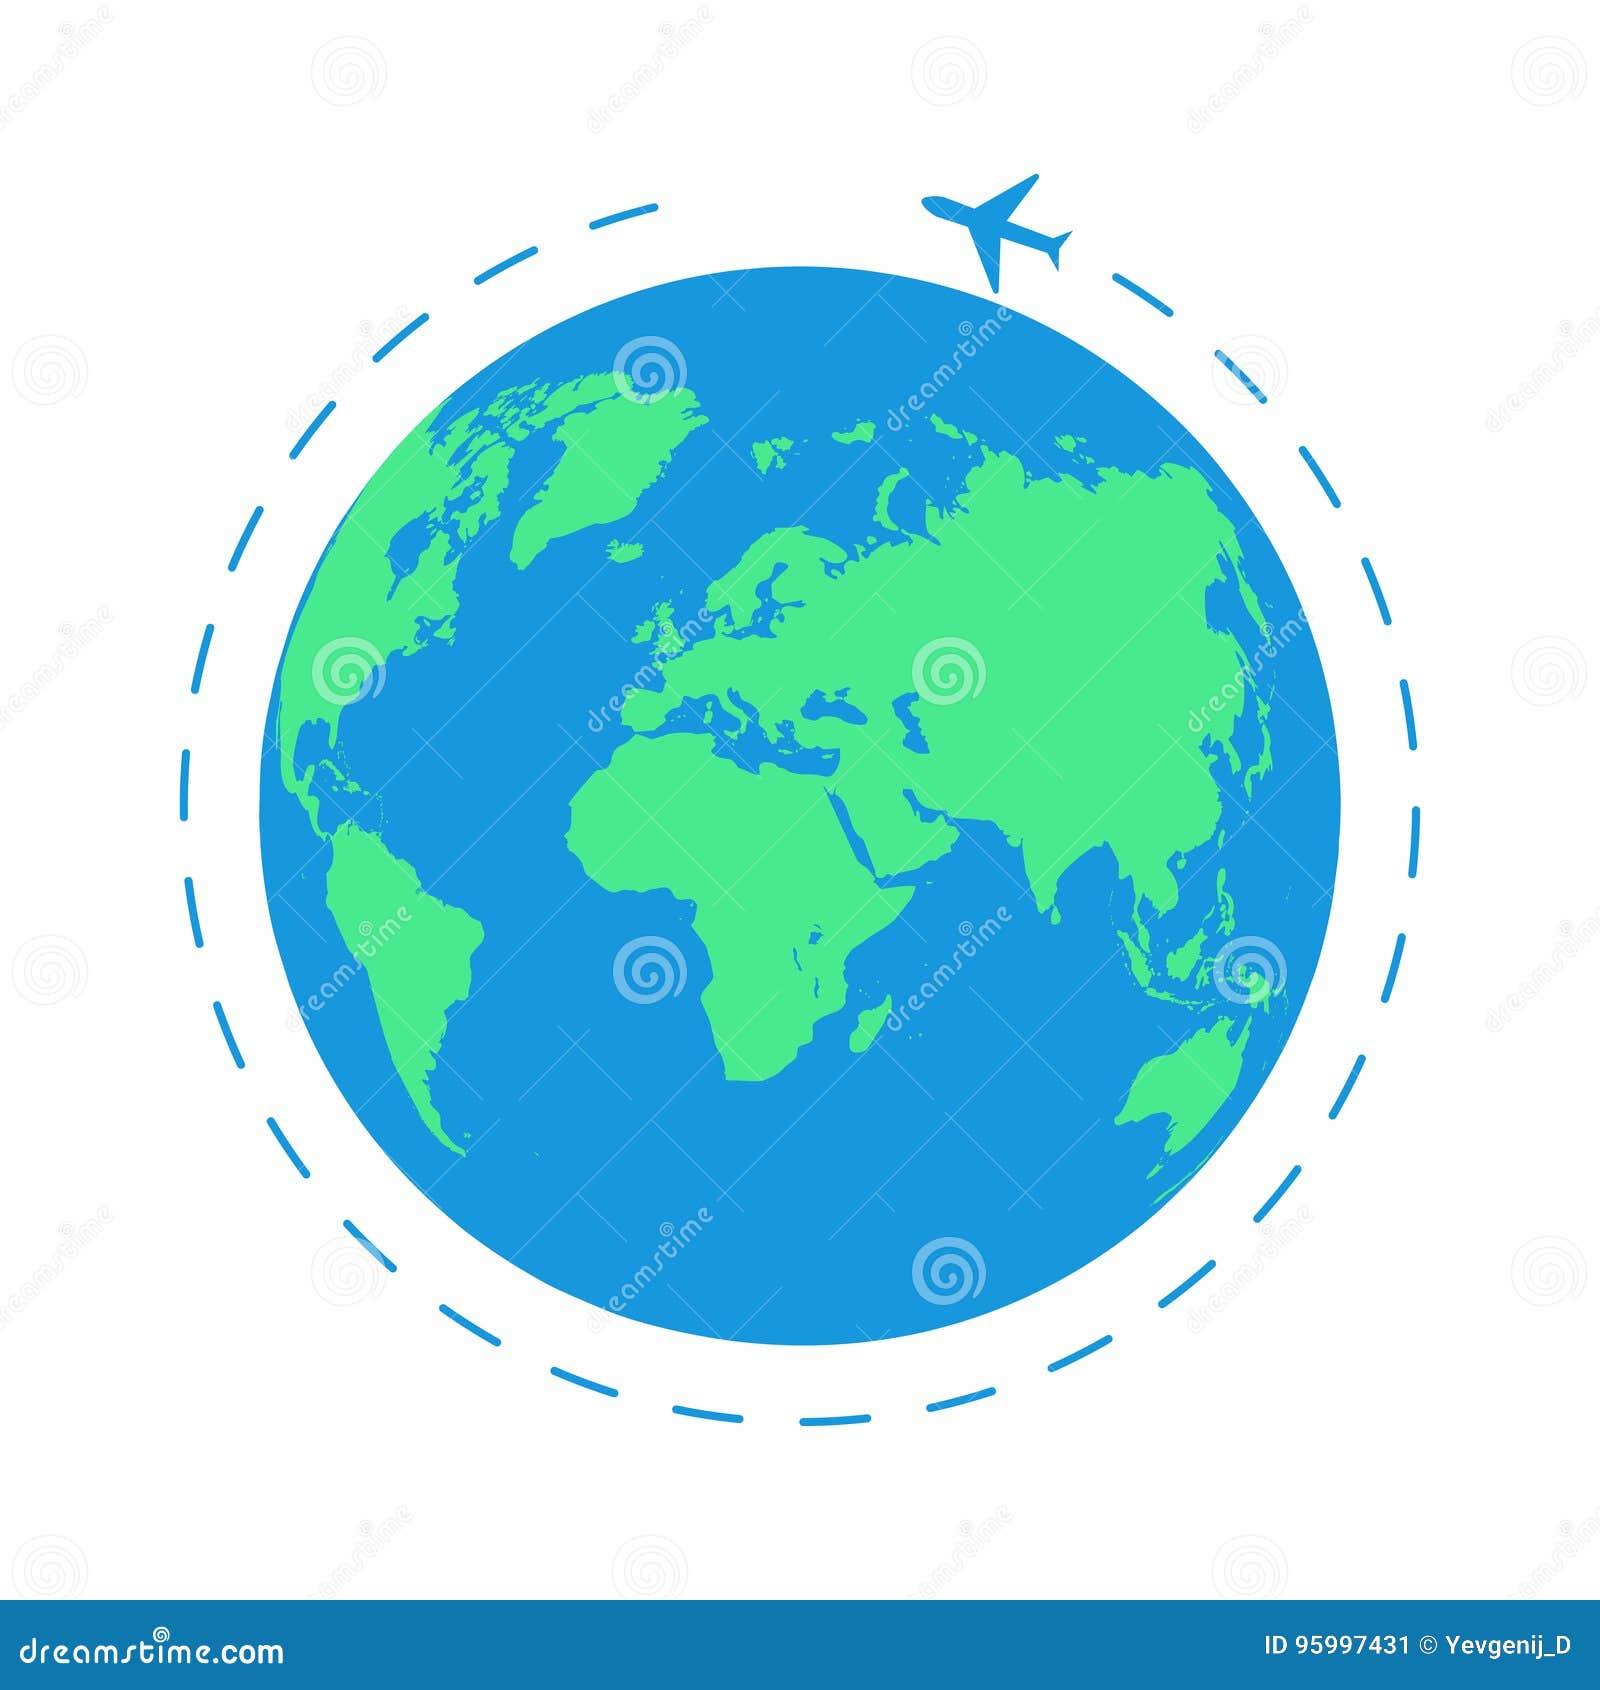 Flying Plane Around The World The Path Plane Airplane